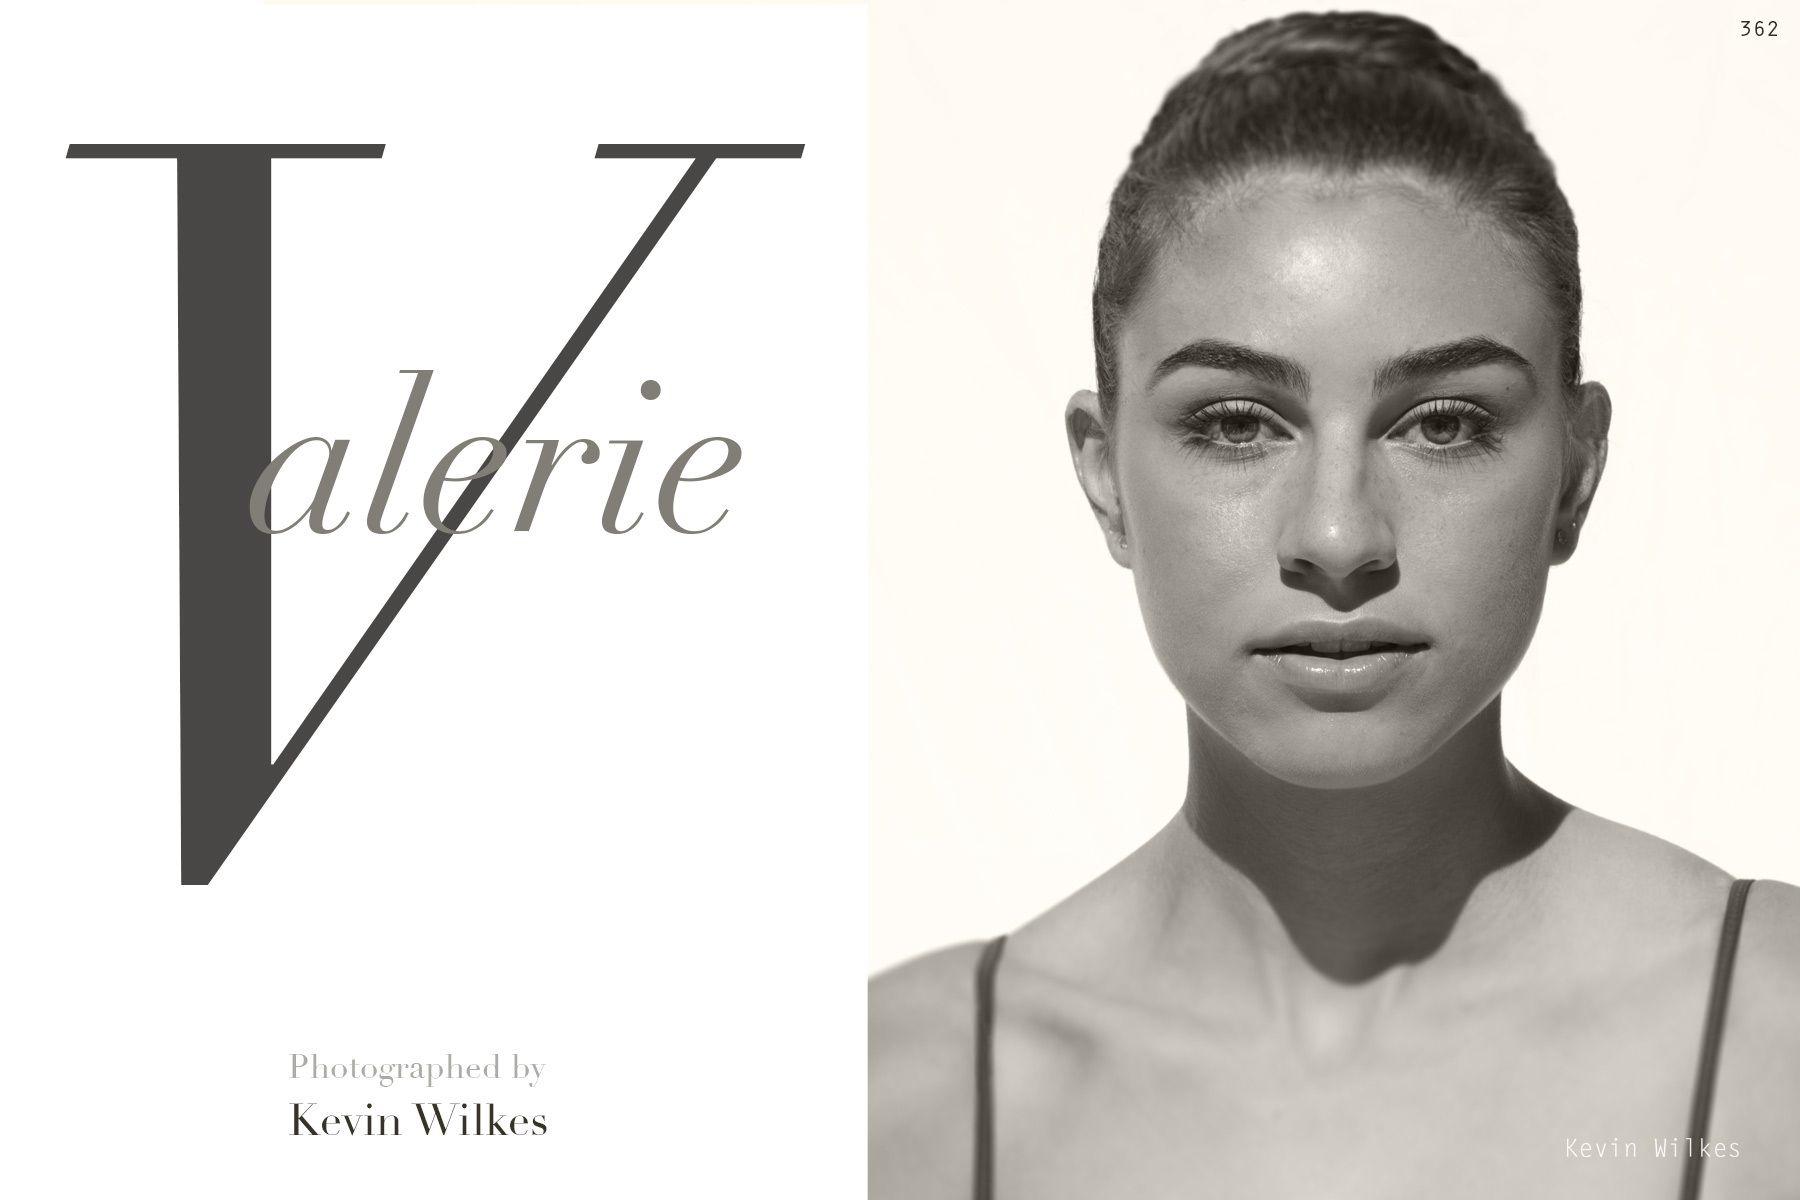 Valerie.